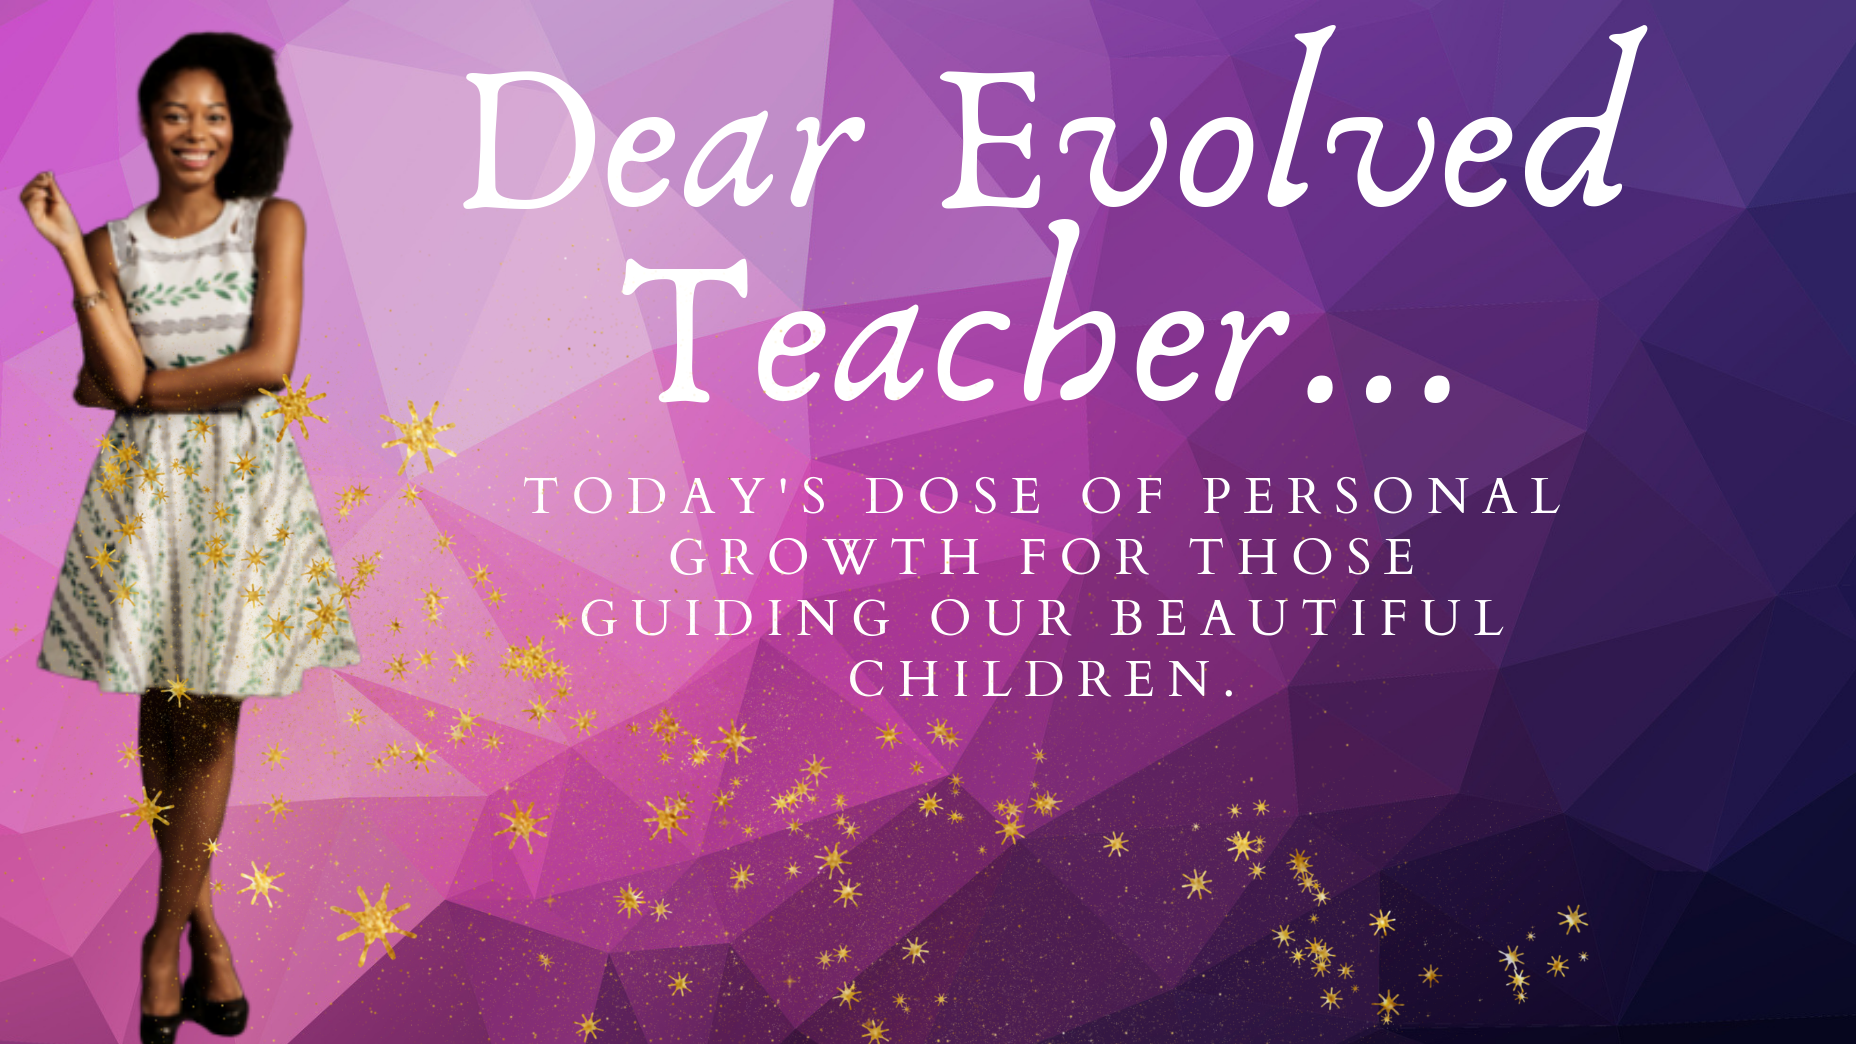 Copy of Dear Evolved Teacher gahmya drummond-bey.png